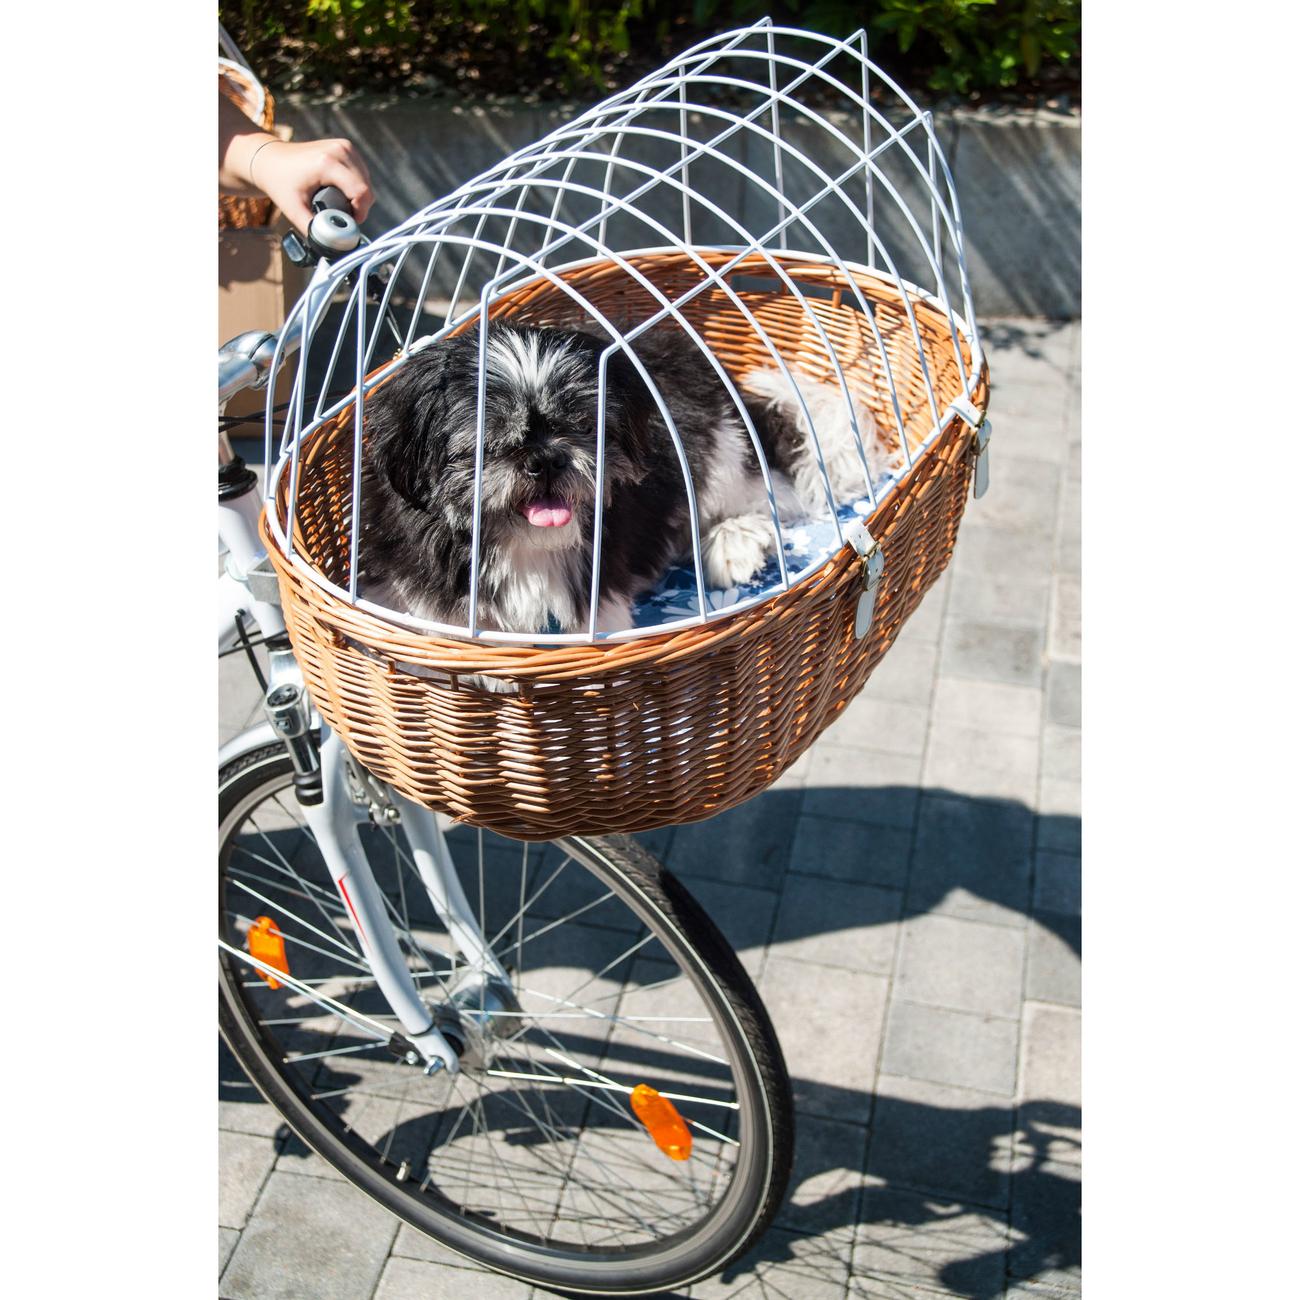 Aumüller E-Bike Hunde Fahrradkorb Standard vorne, Bild 3